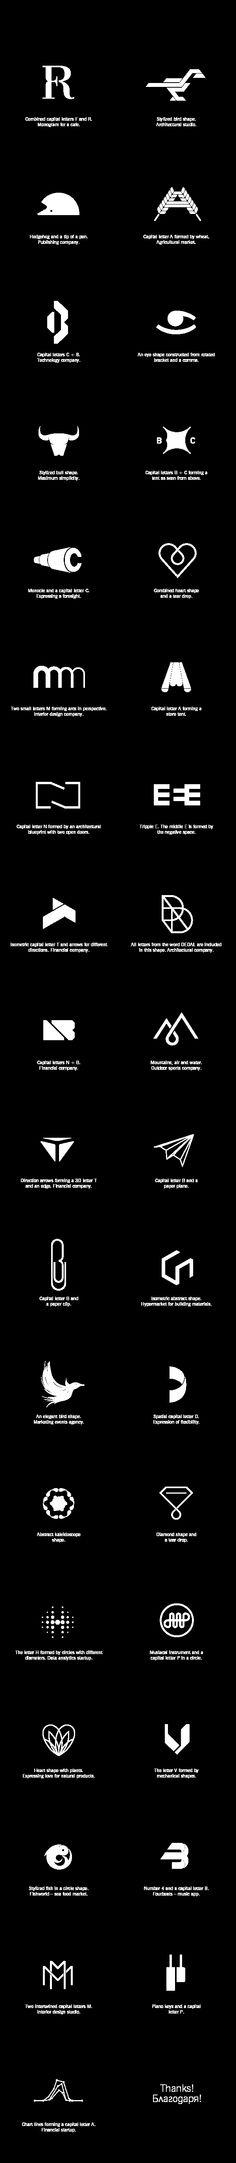 Marks & Monograms by Dimiter Petrov, via Behance